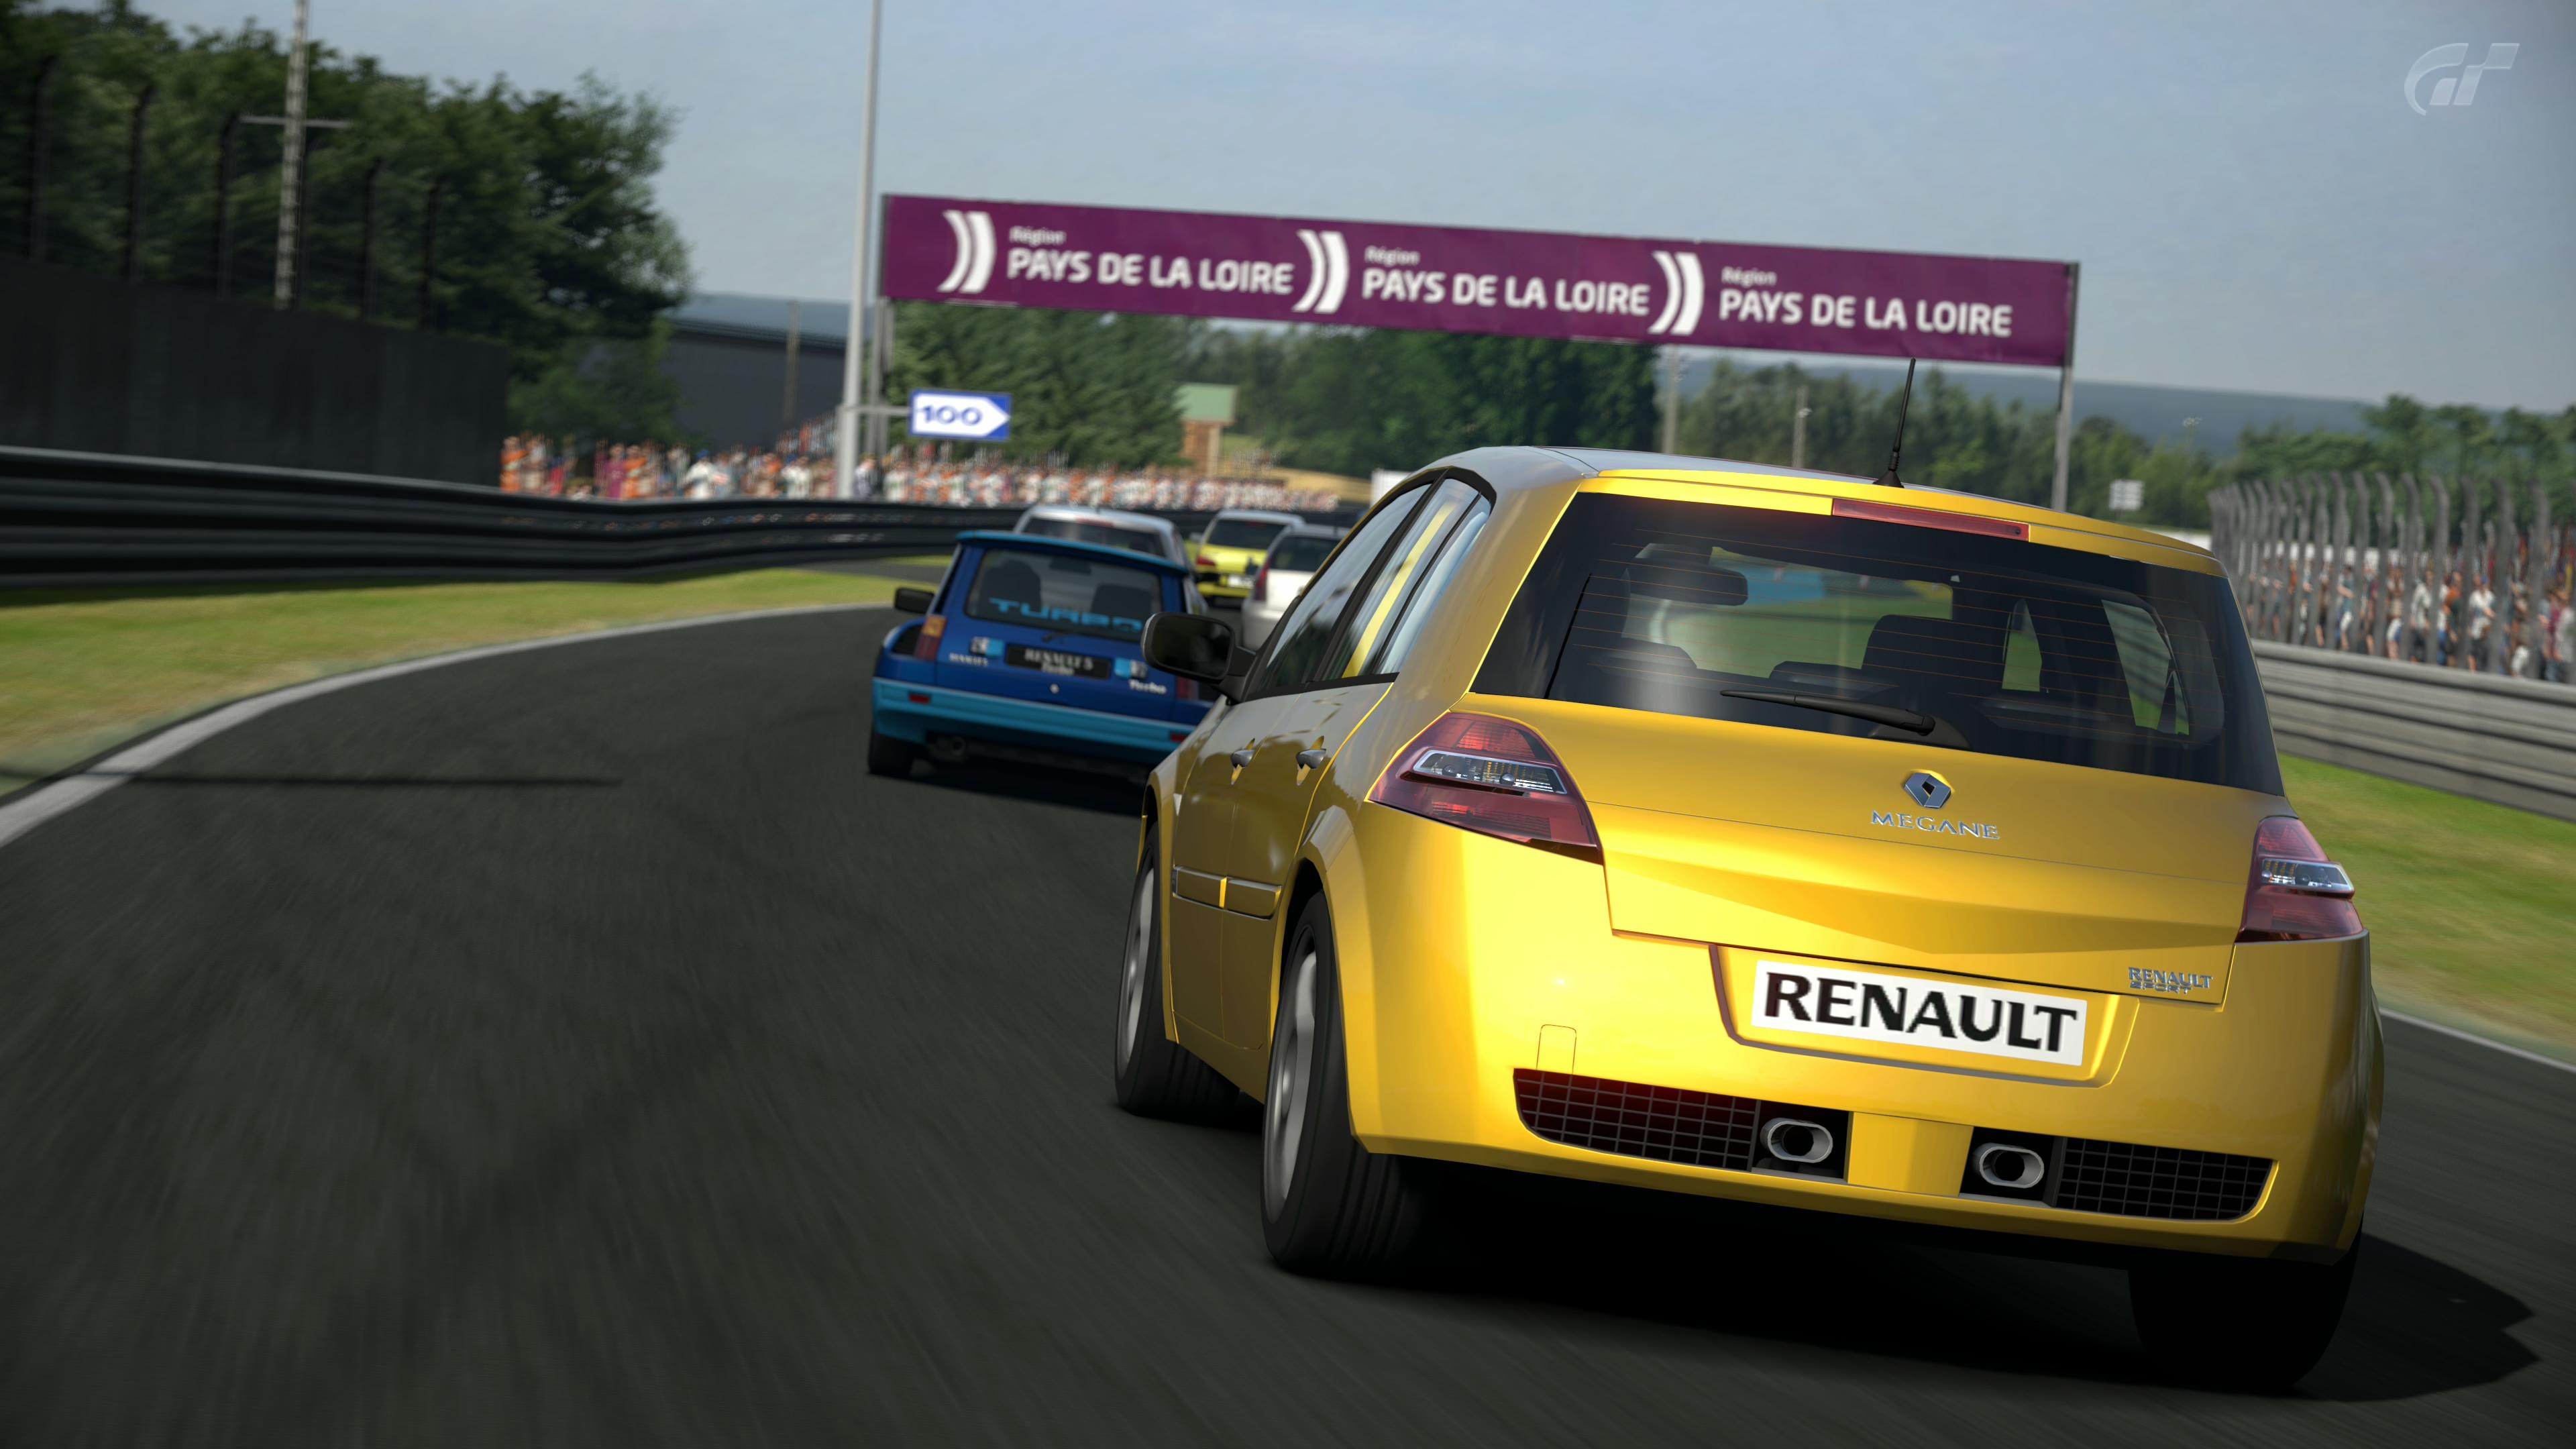 Renault sport megane photo